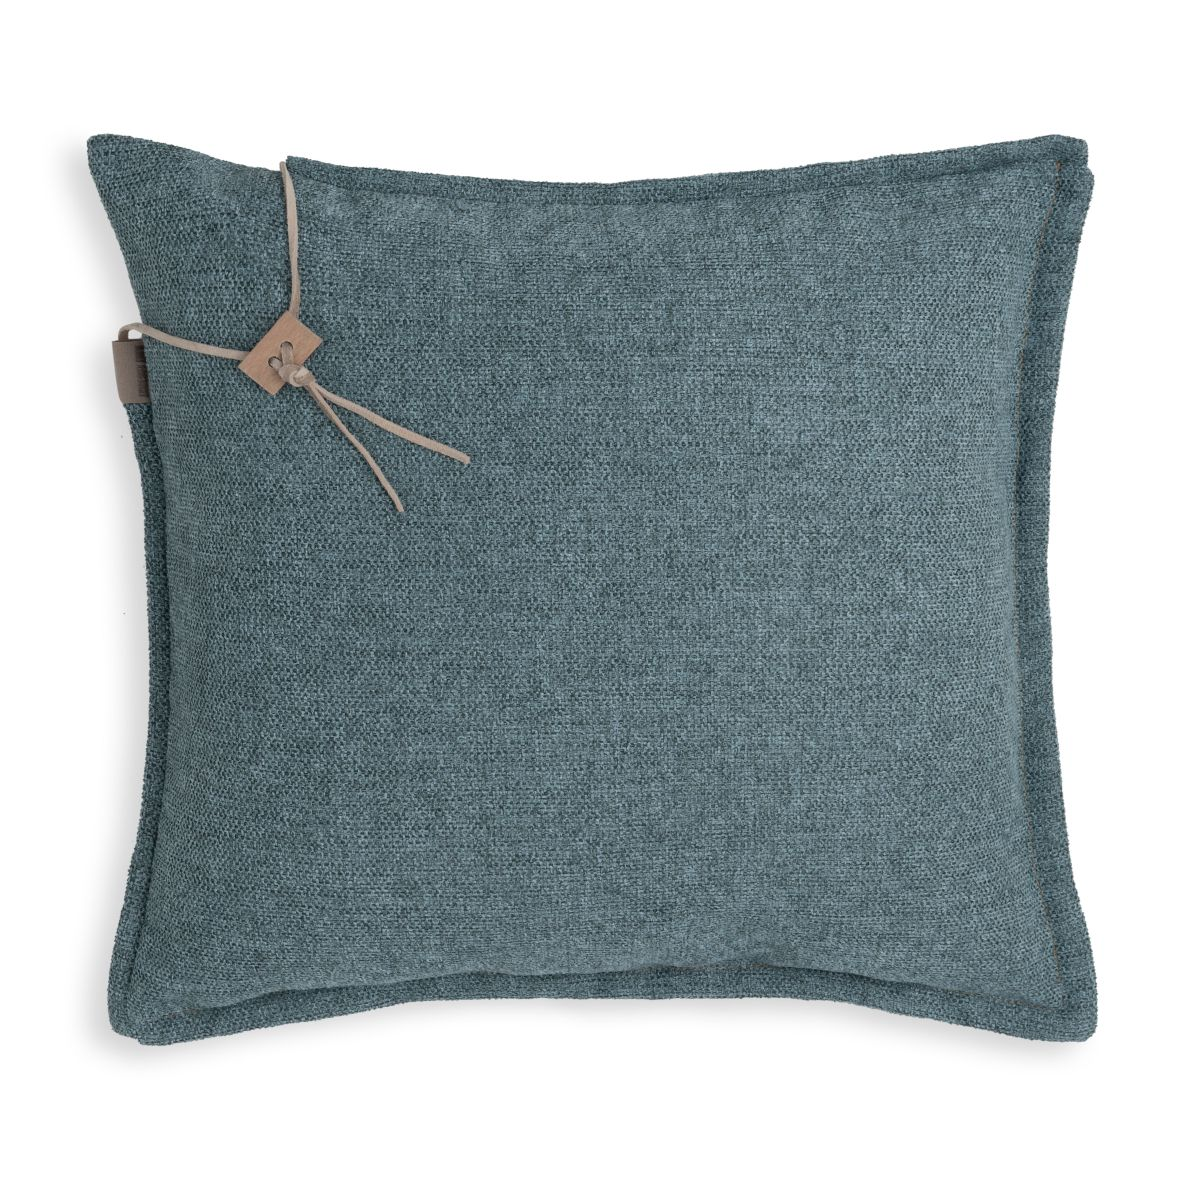 knit factory kf153012013 imre kussen jeans 50x50 1